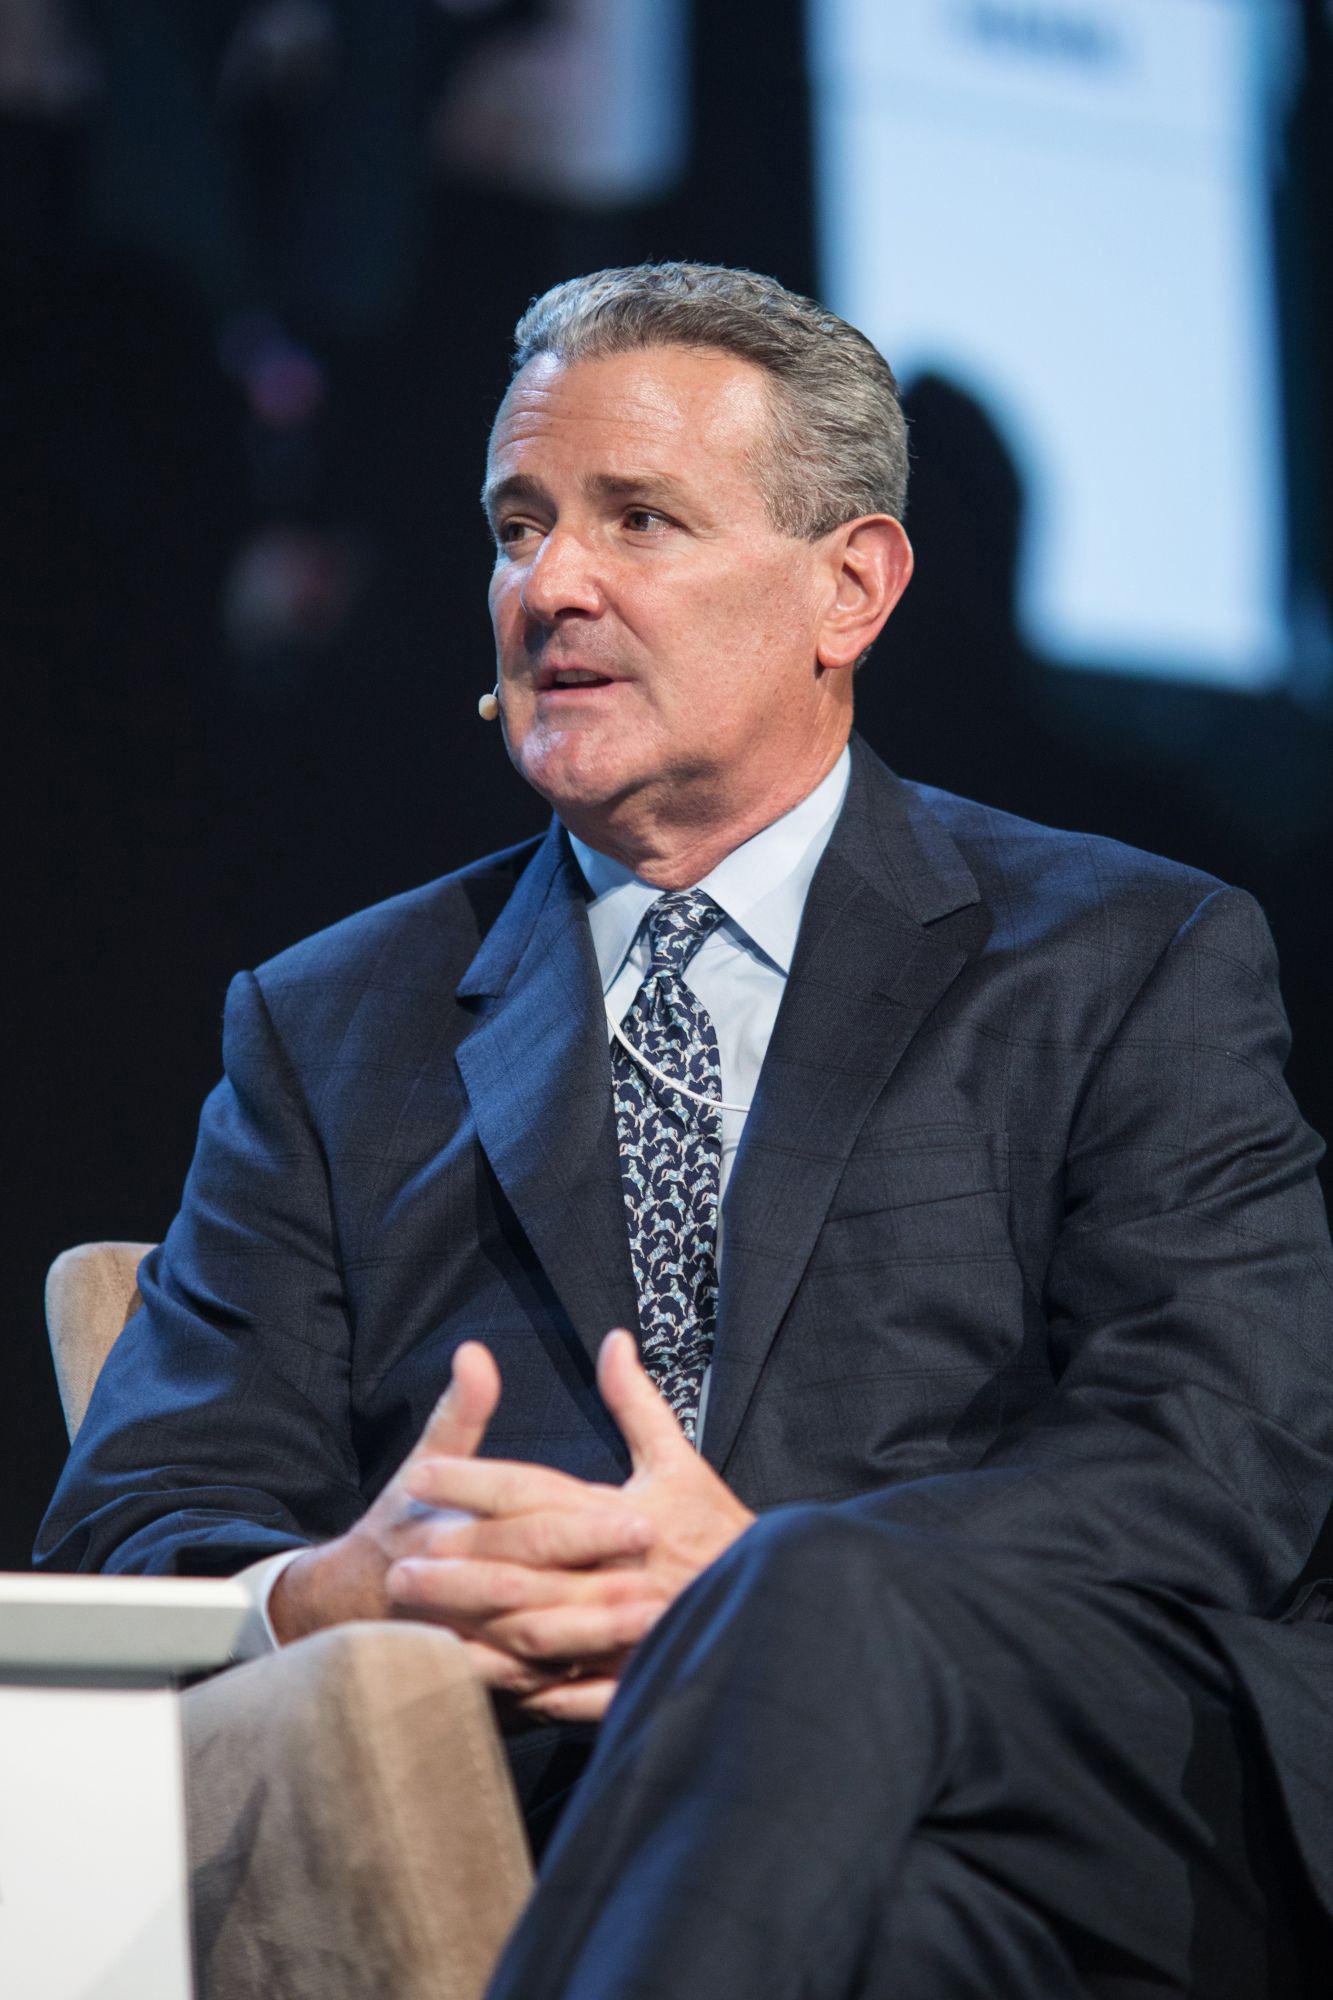 Anadarko's CEO gets a $98 million golden parachute after